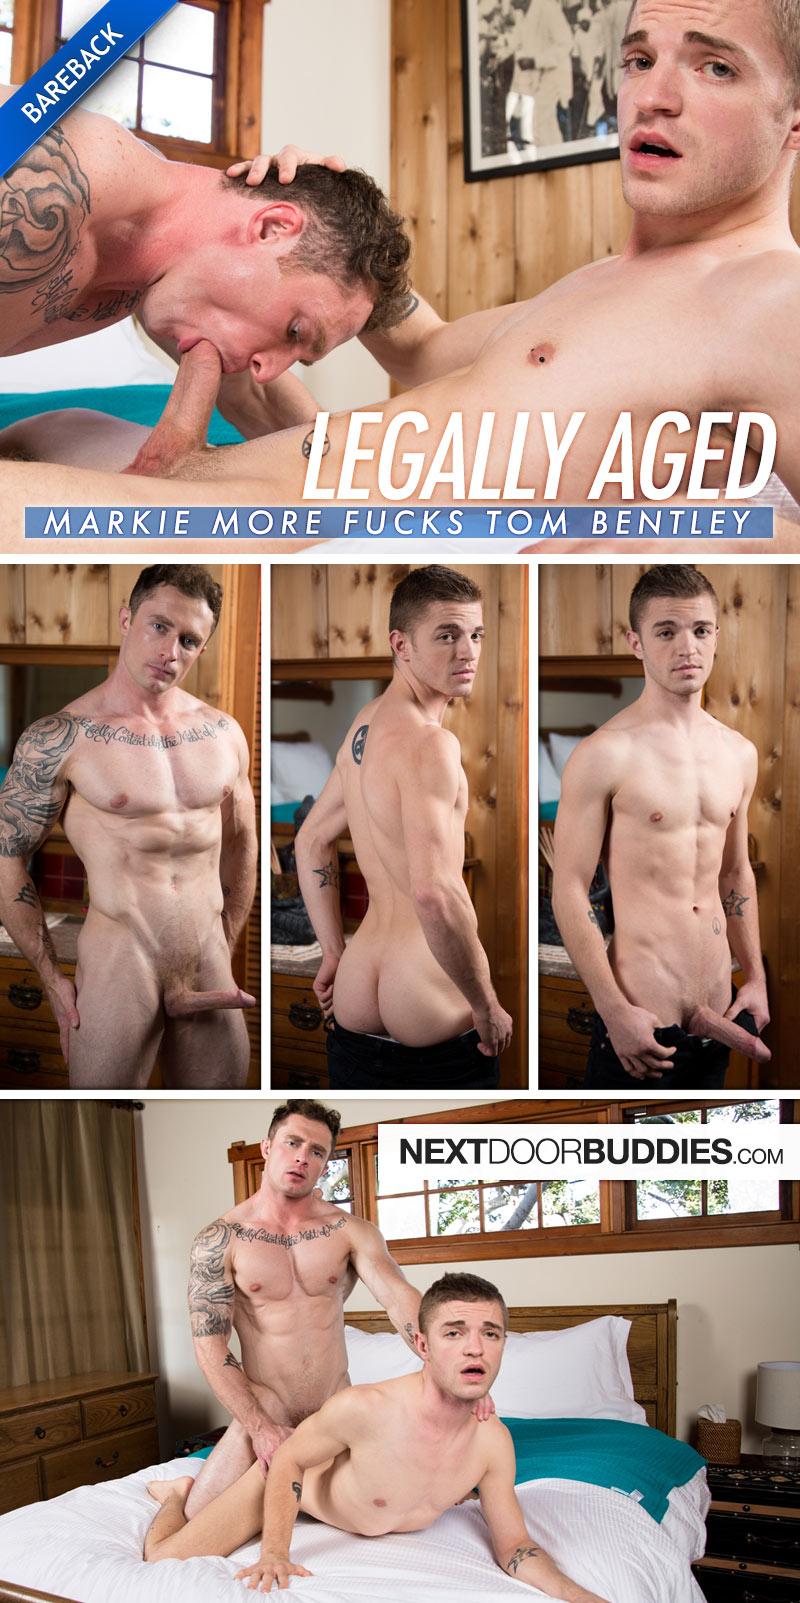 Legally Aged (Markie More Fucks Tom Bentley) (Bareback) at Next Door Buddies